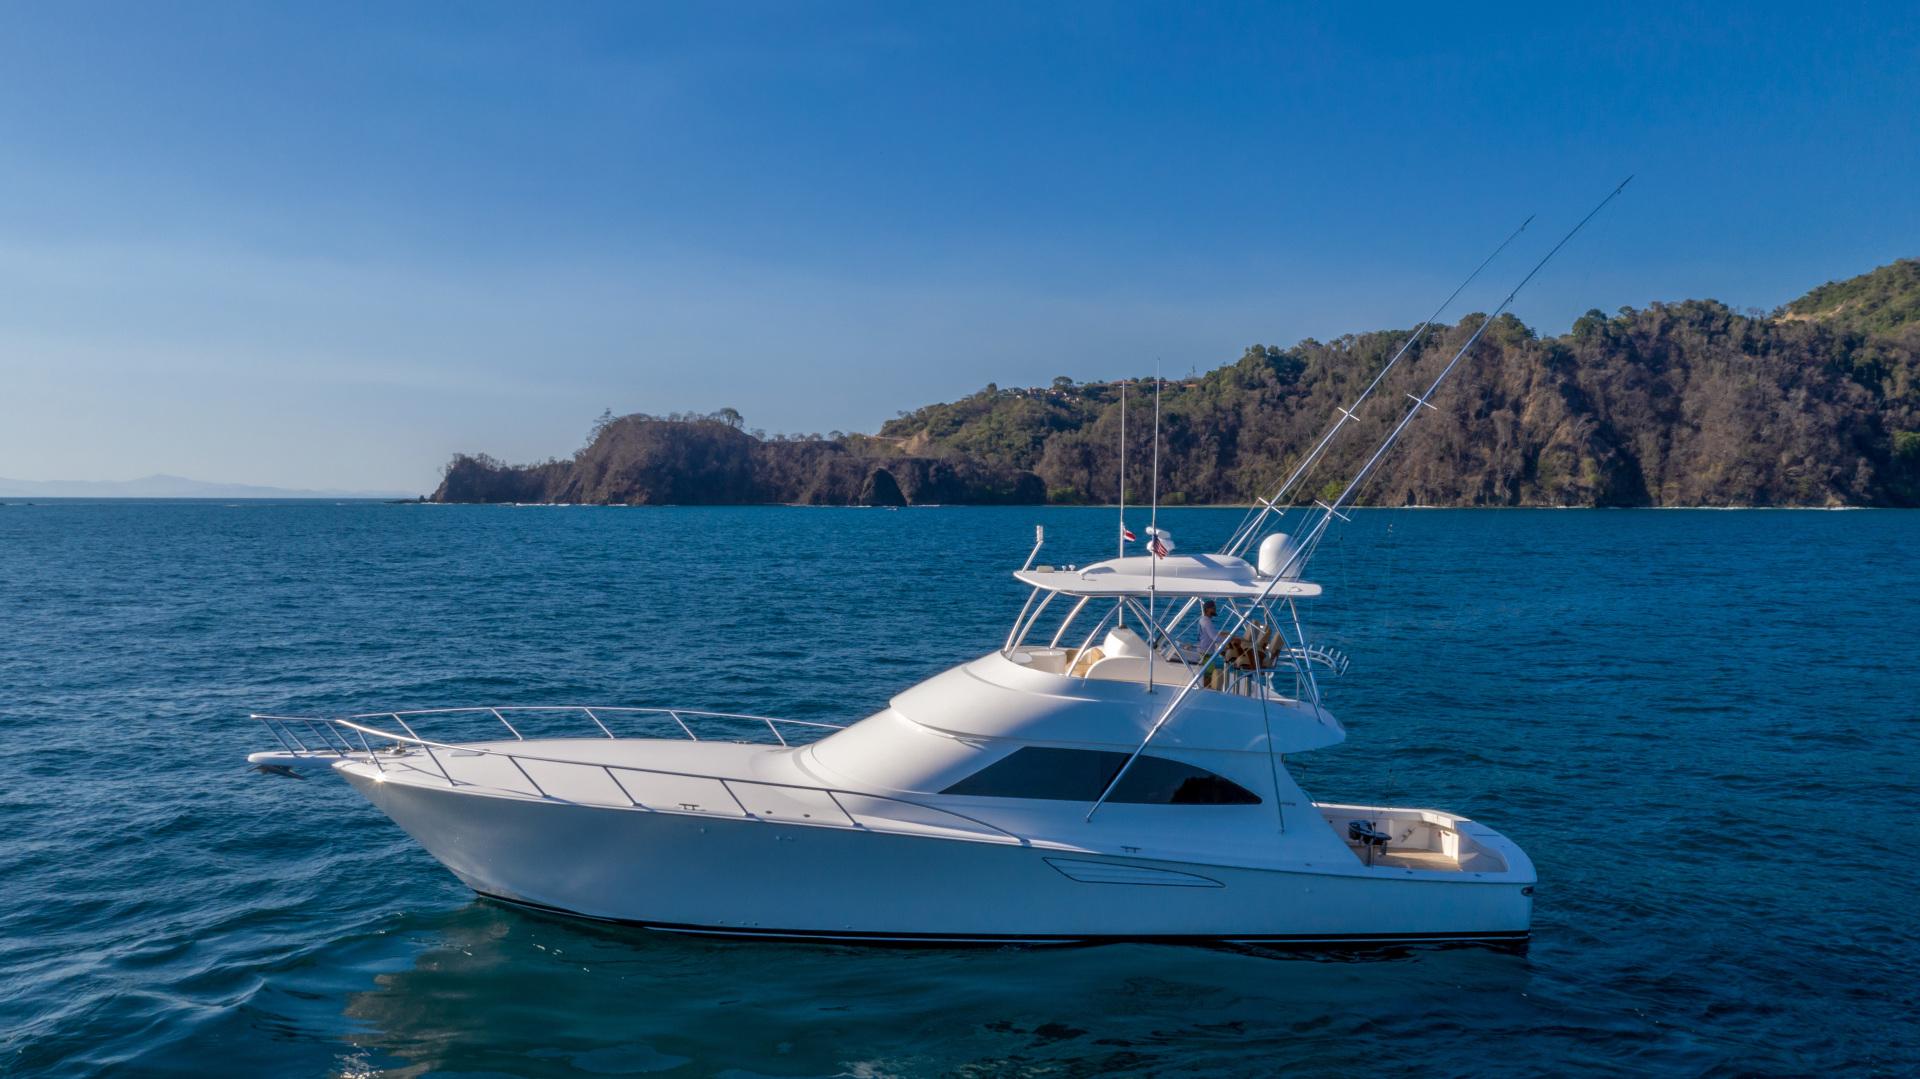 Viking-62 Convertible 2014-Mixer Playa Herradura, Los Suenos,-Costa Rica-2014 Viking 62 Convertible  Port Profile-1356271 | Thumbnail